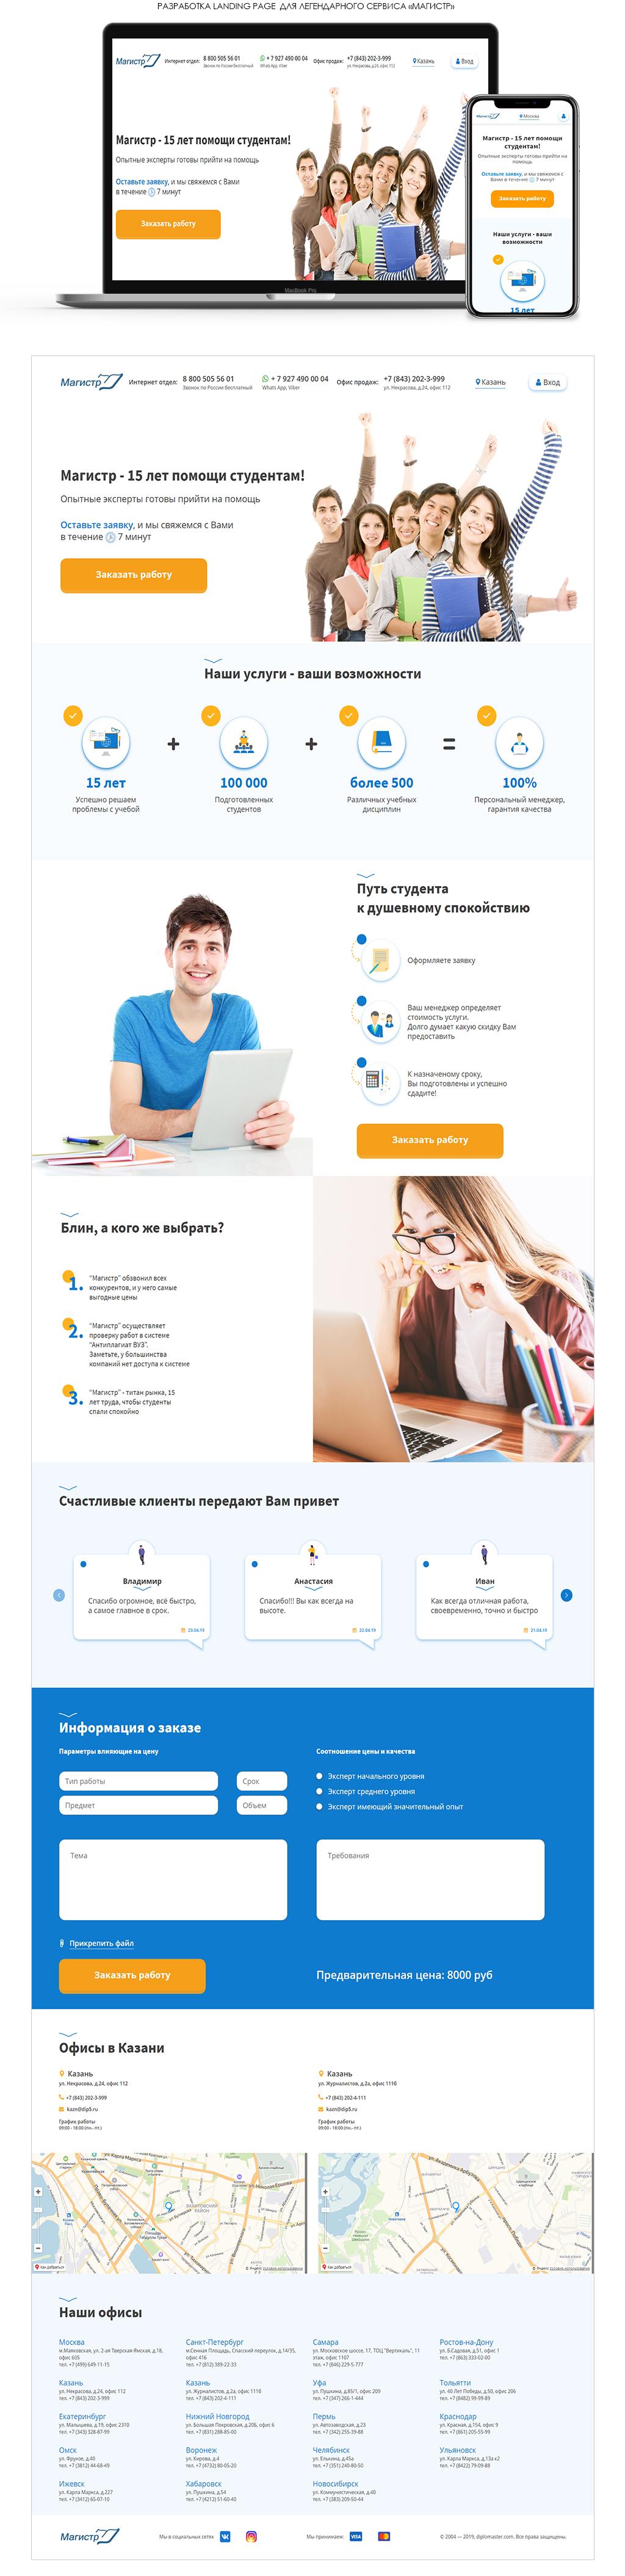 Landing page для сервиса помощи студентам - Магистр